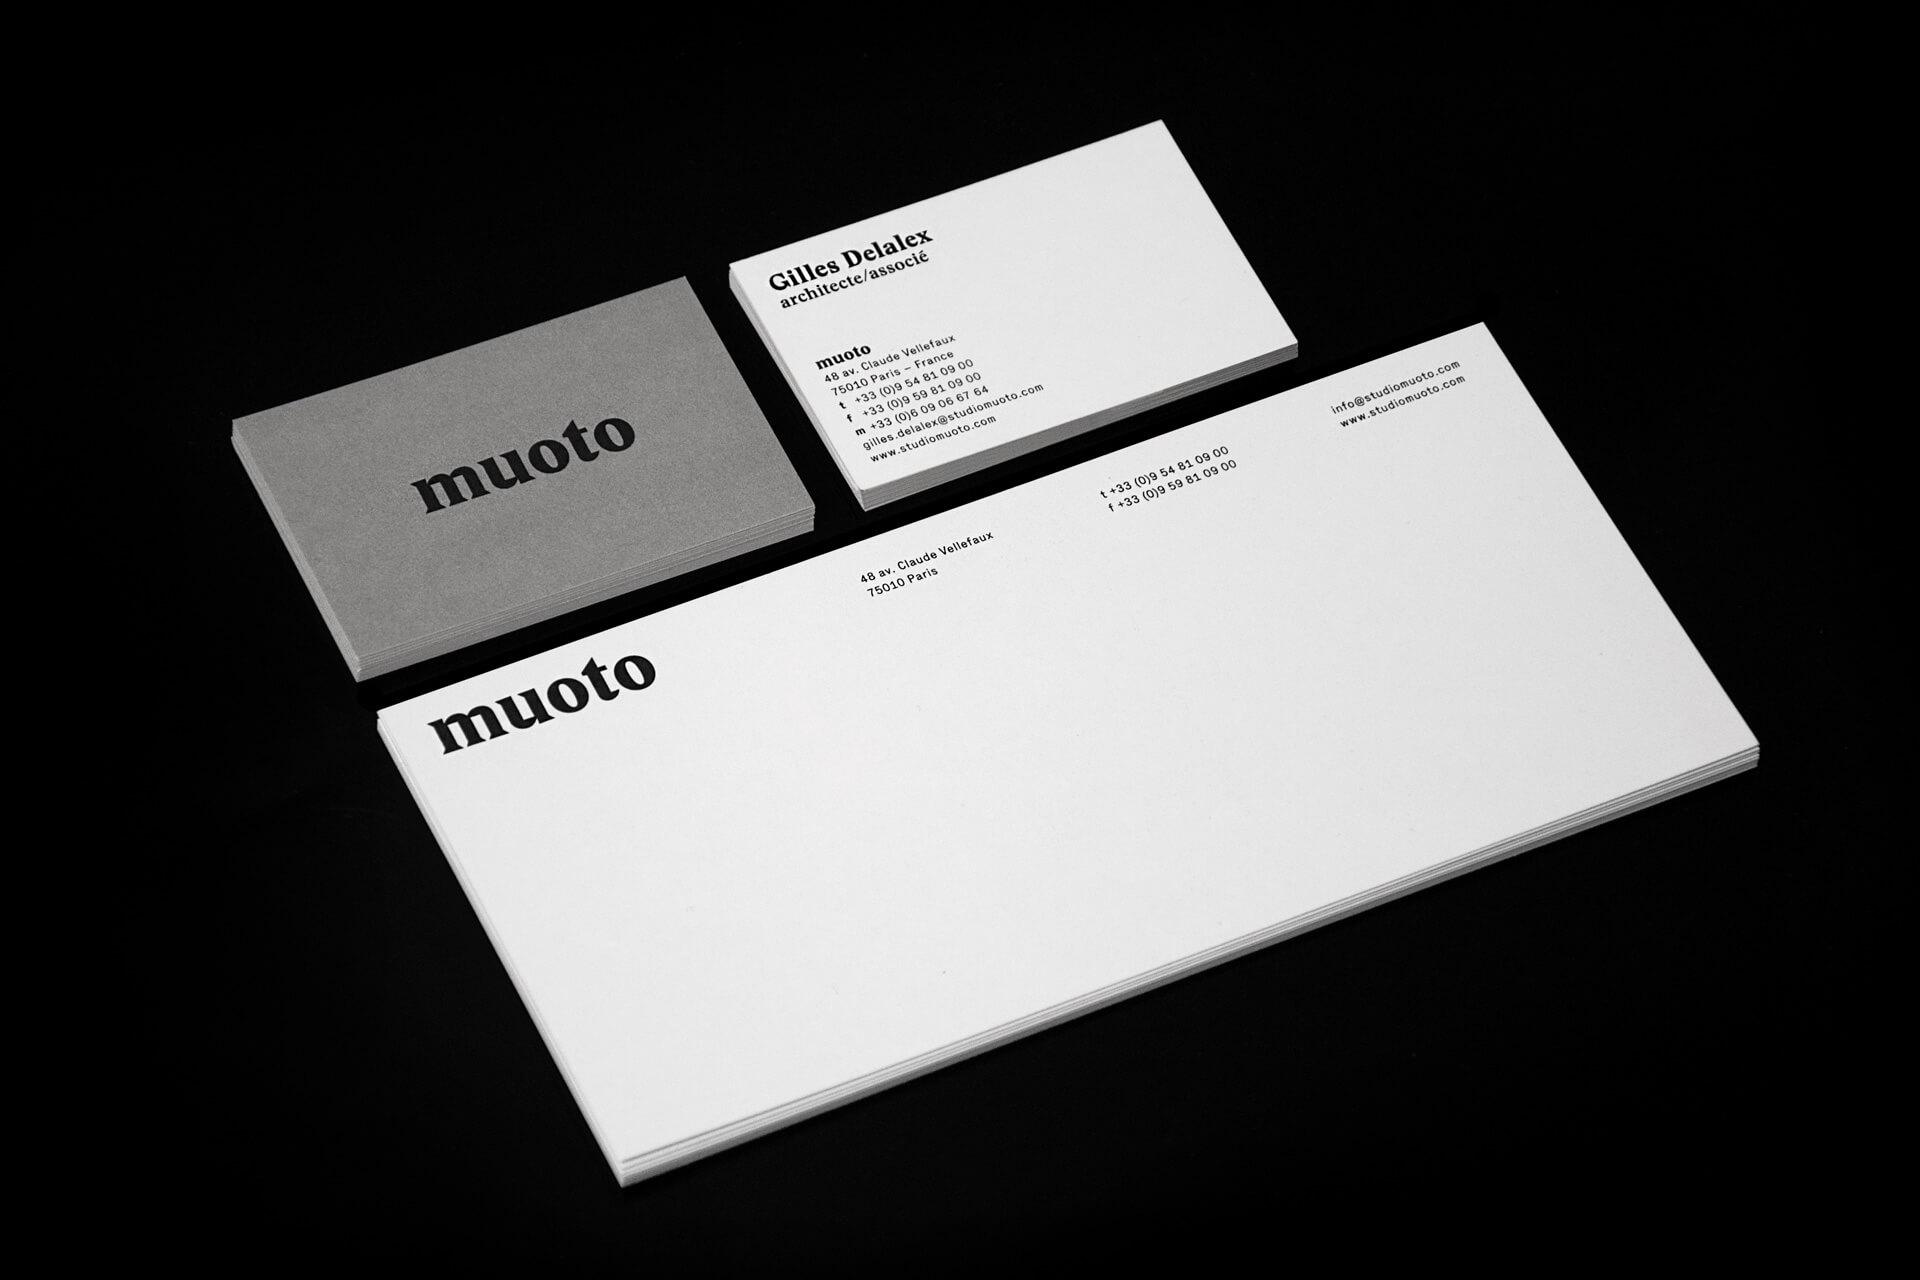 muoto-papeterie-plastac-01